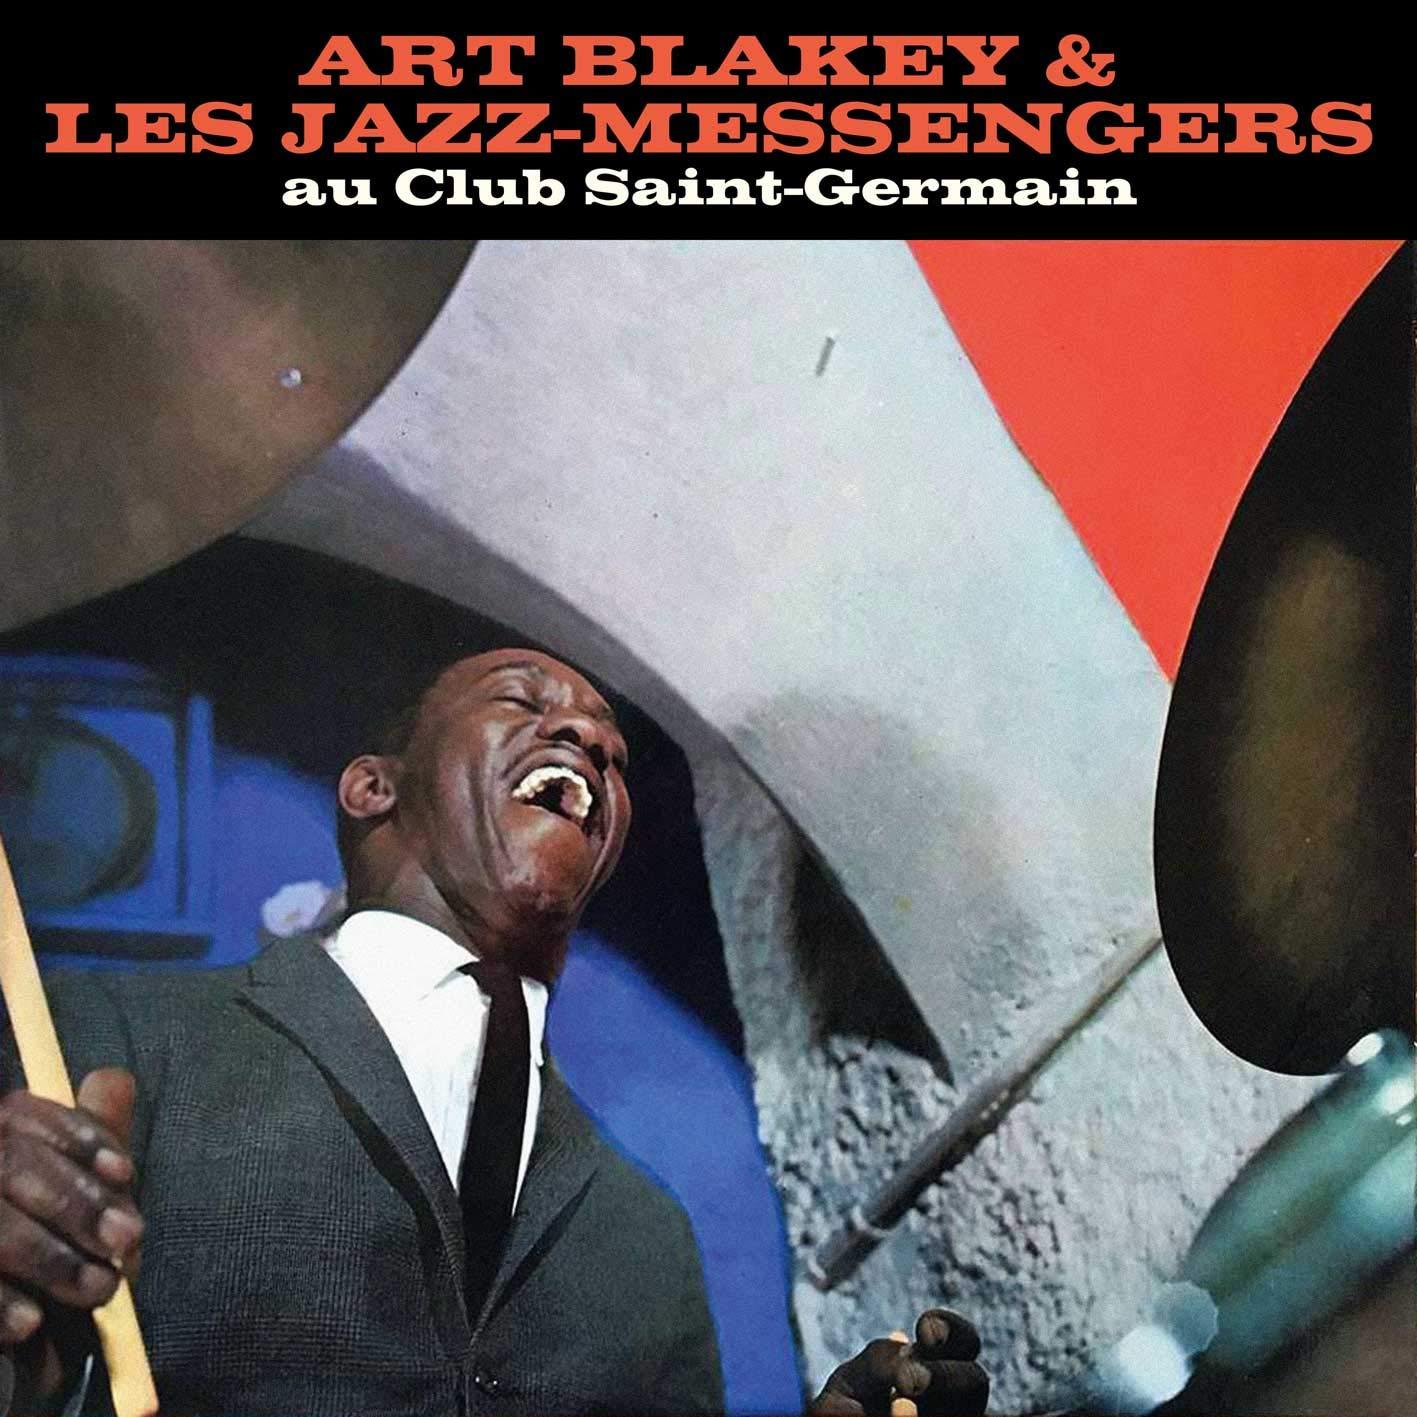 Vinilo : BLAKEY, ART & LES JAZZ-MESSENGERS - Au Club Saint-germain (Italy - Import)